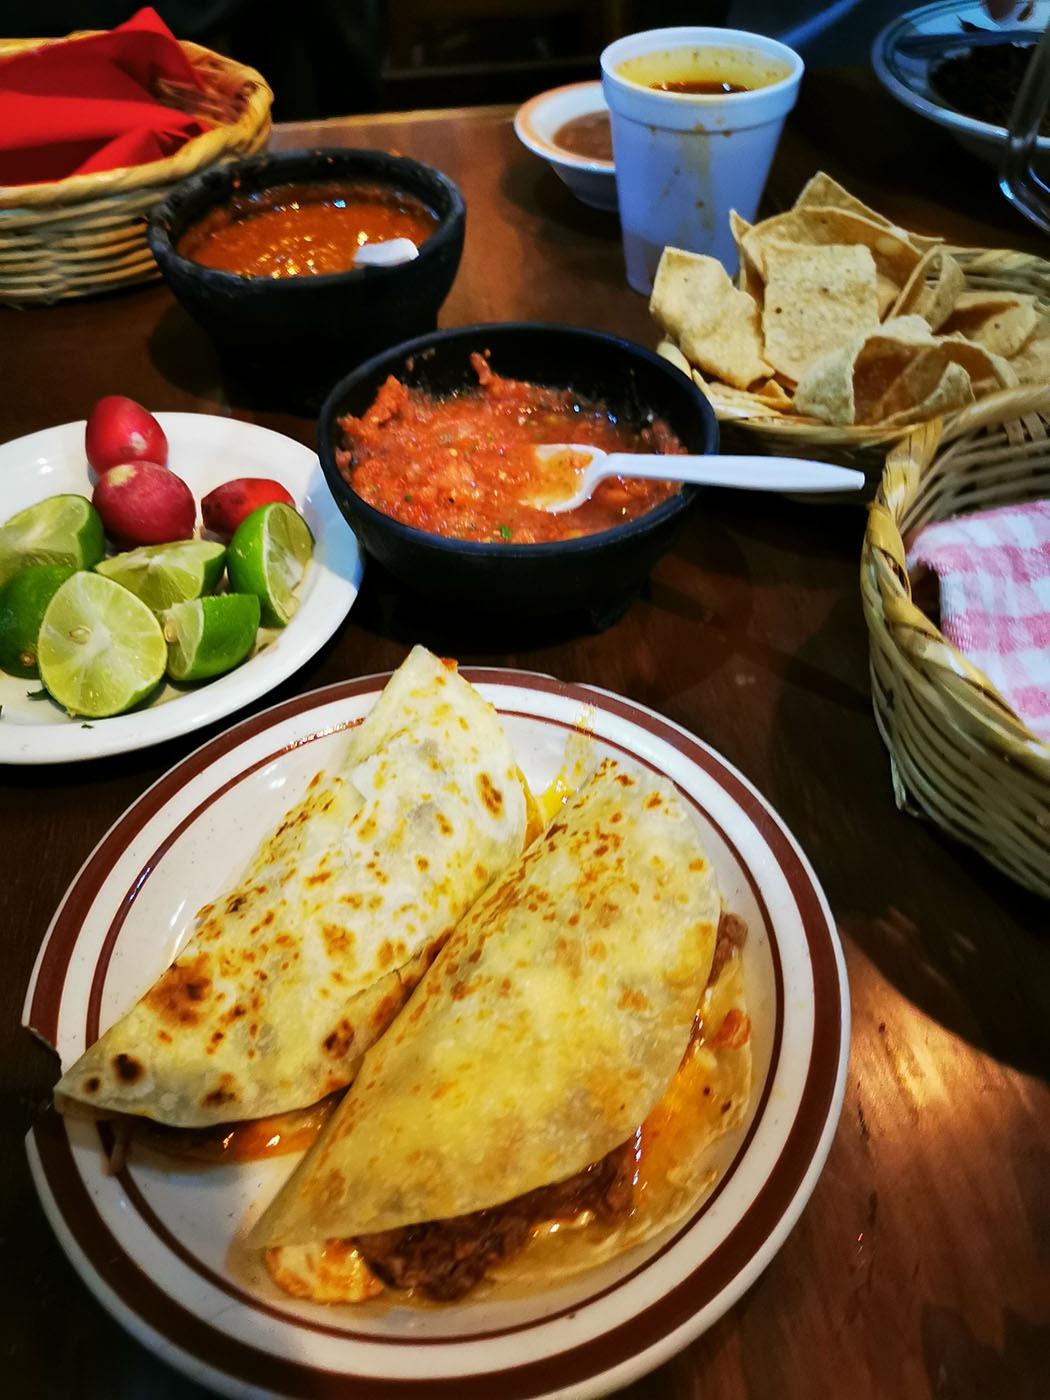 Quesadilla, a traditional Mexican dish